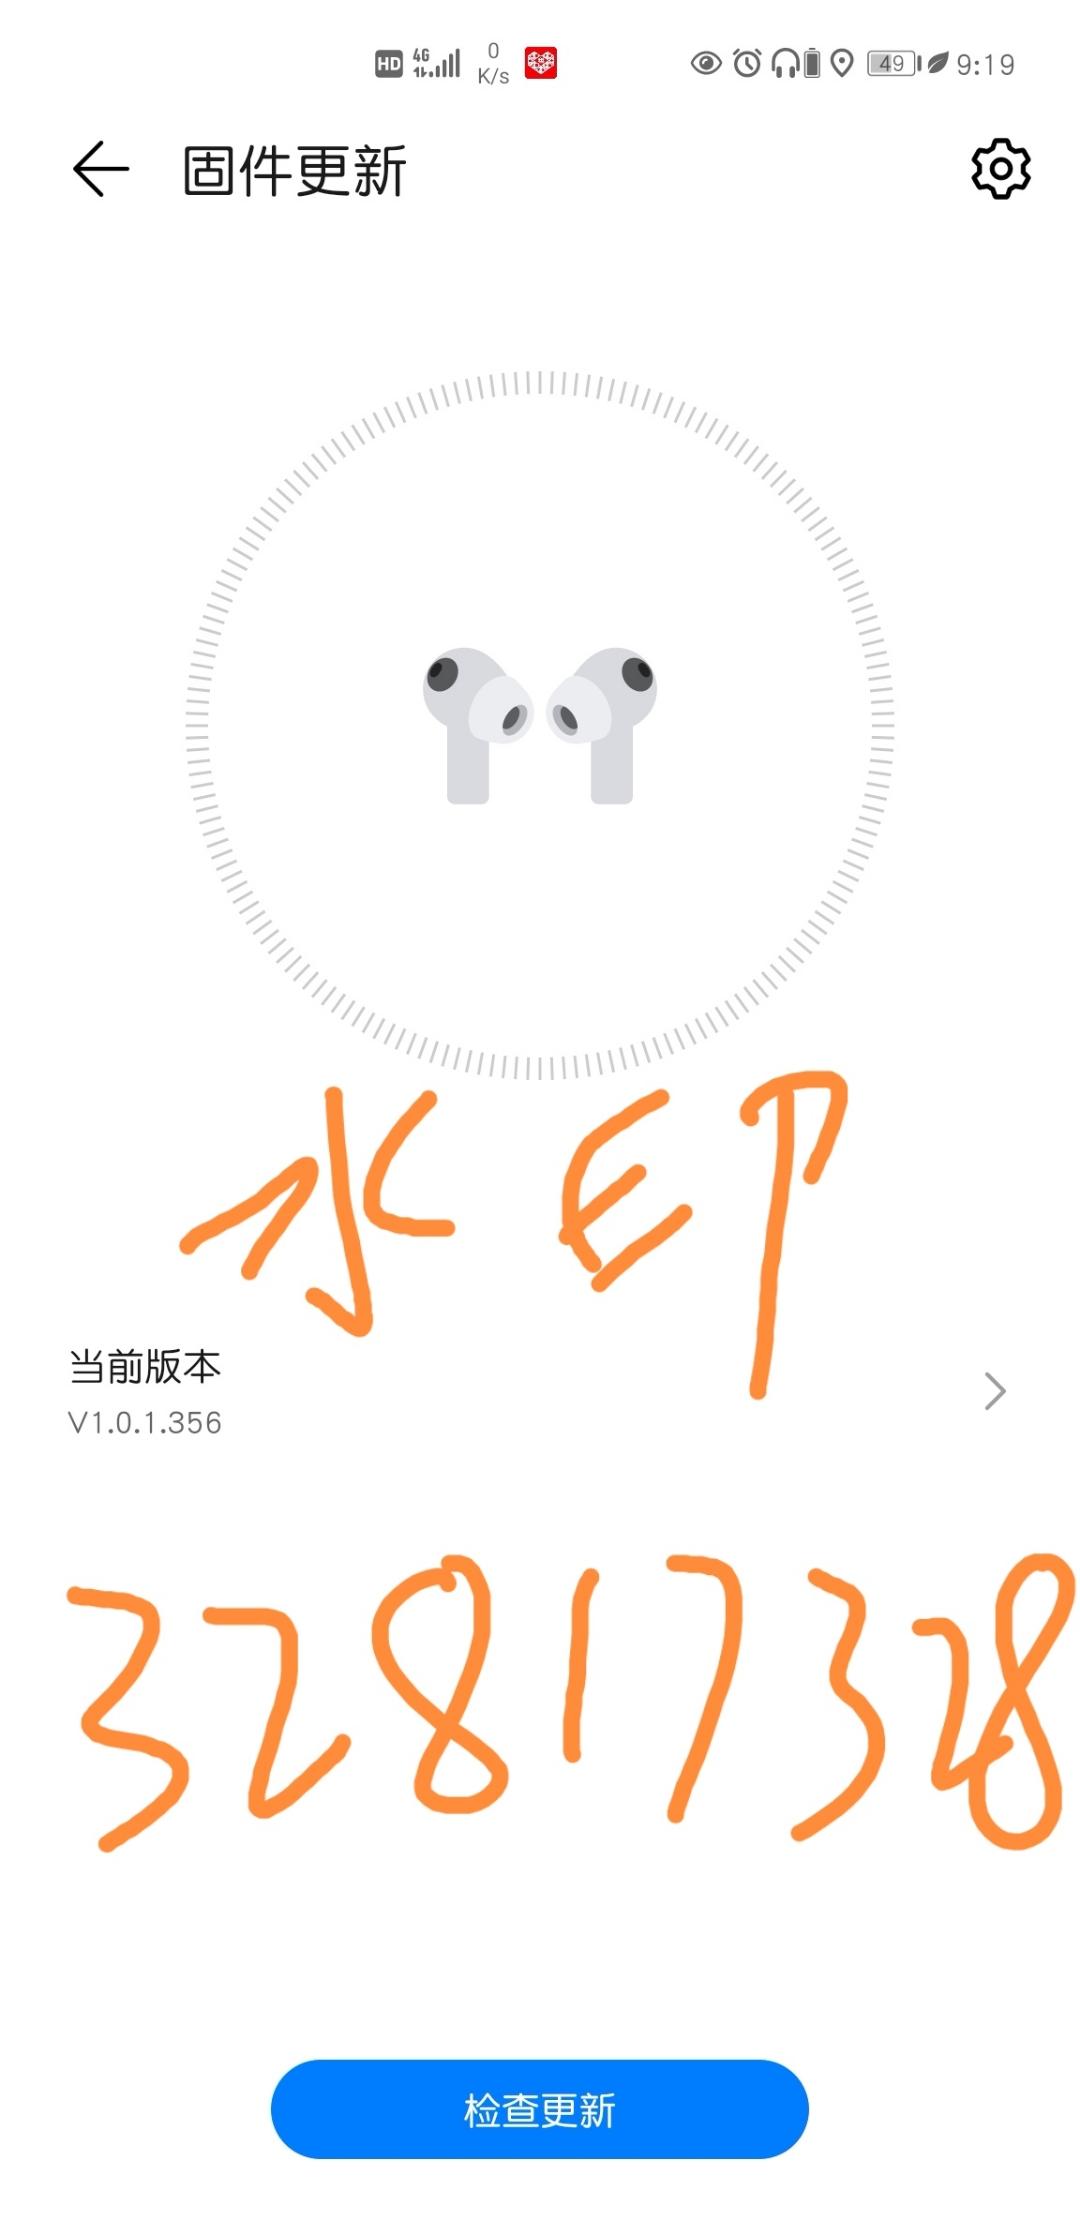 Screenshot_20210404_091924_com.huawei.smarthome_edit_4104551037914.jpg